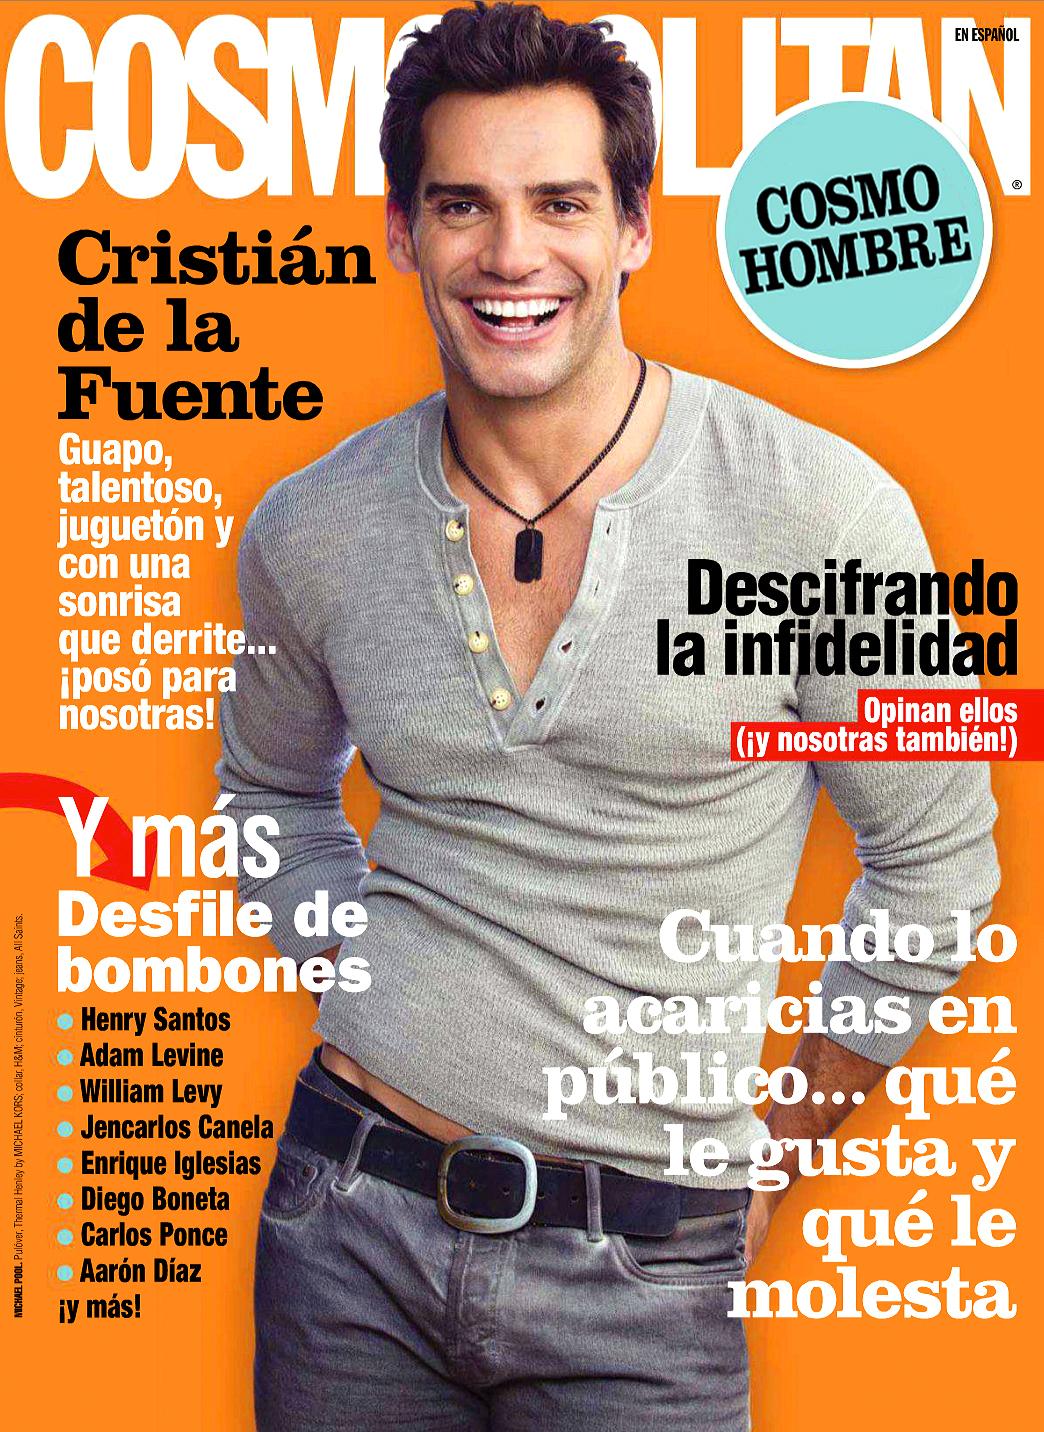 Final Cover retouching for Cosmopolitan Magazine at Thomas Canny Studio.jpg